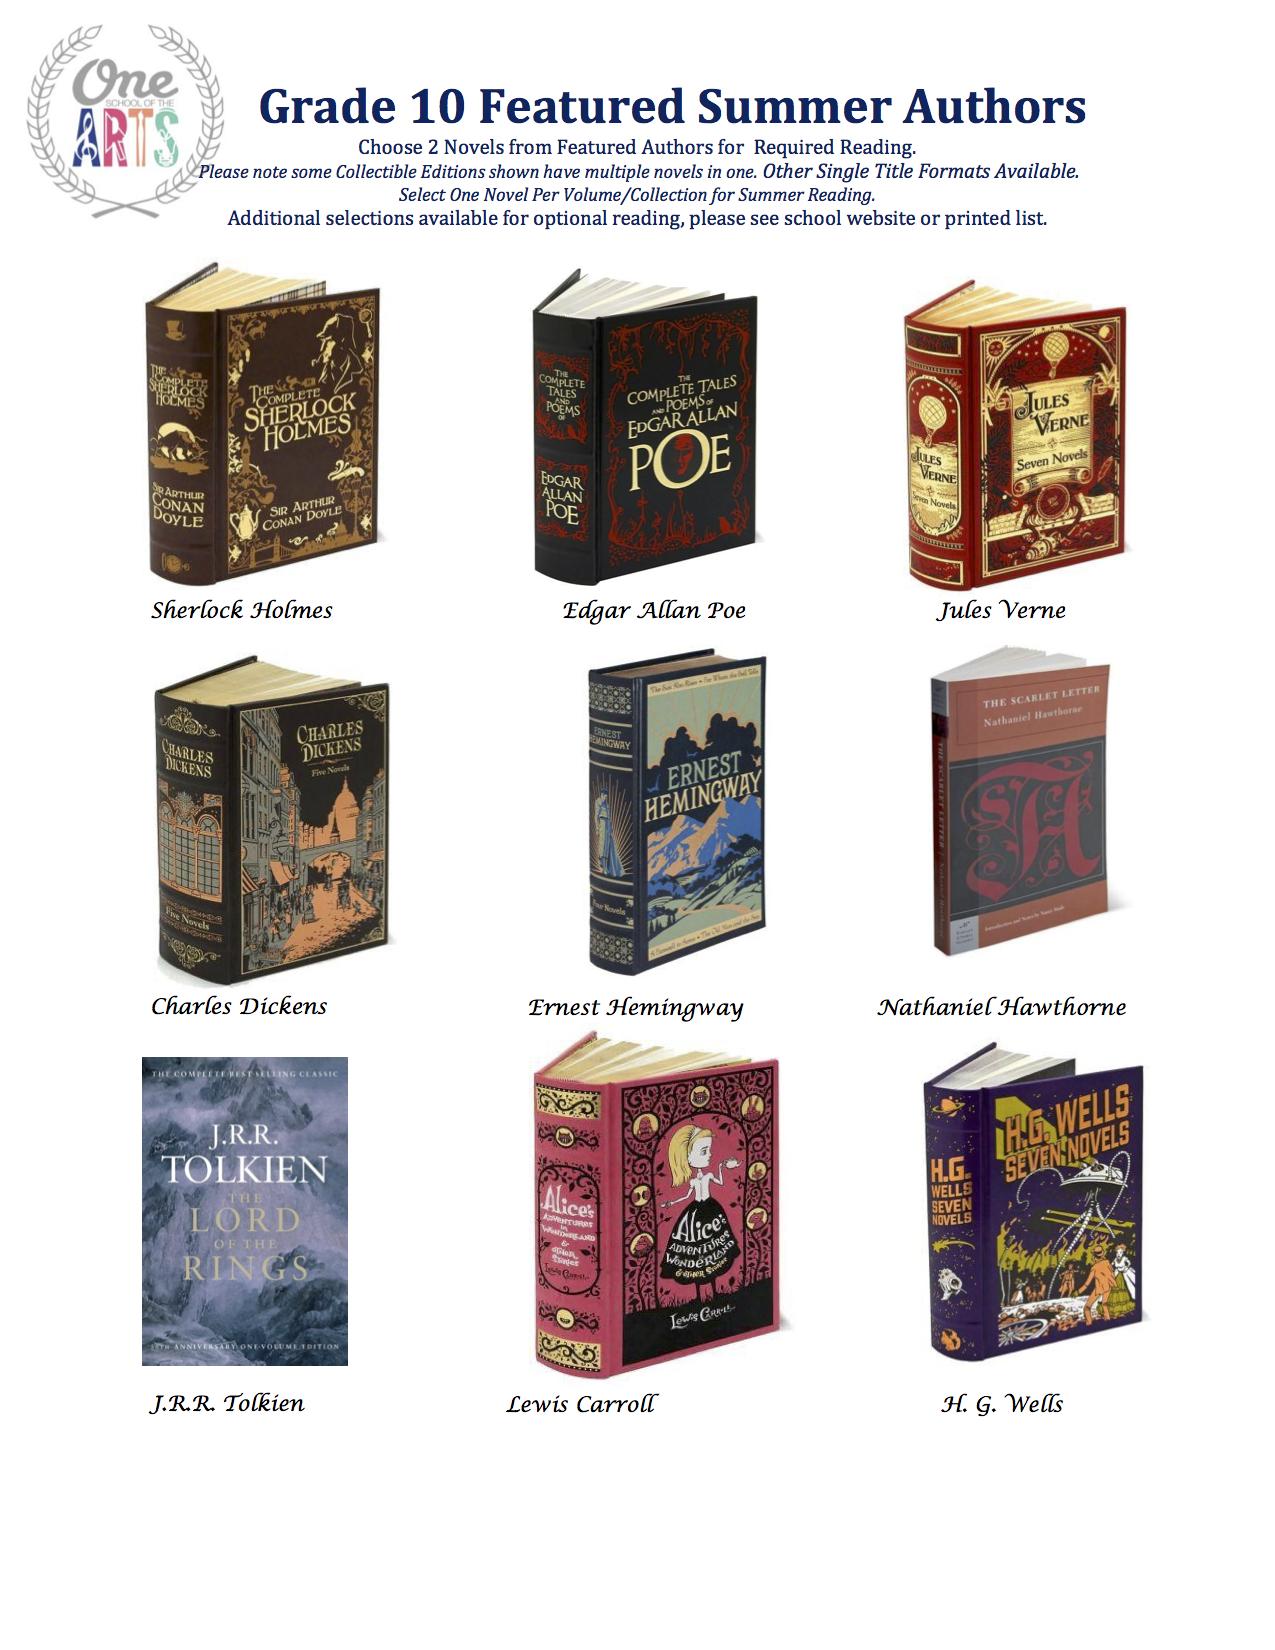 Grade 10 Featured Authors 2015.jpeg